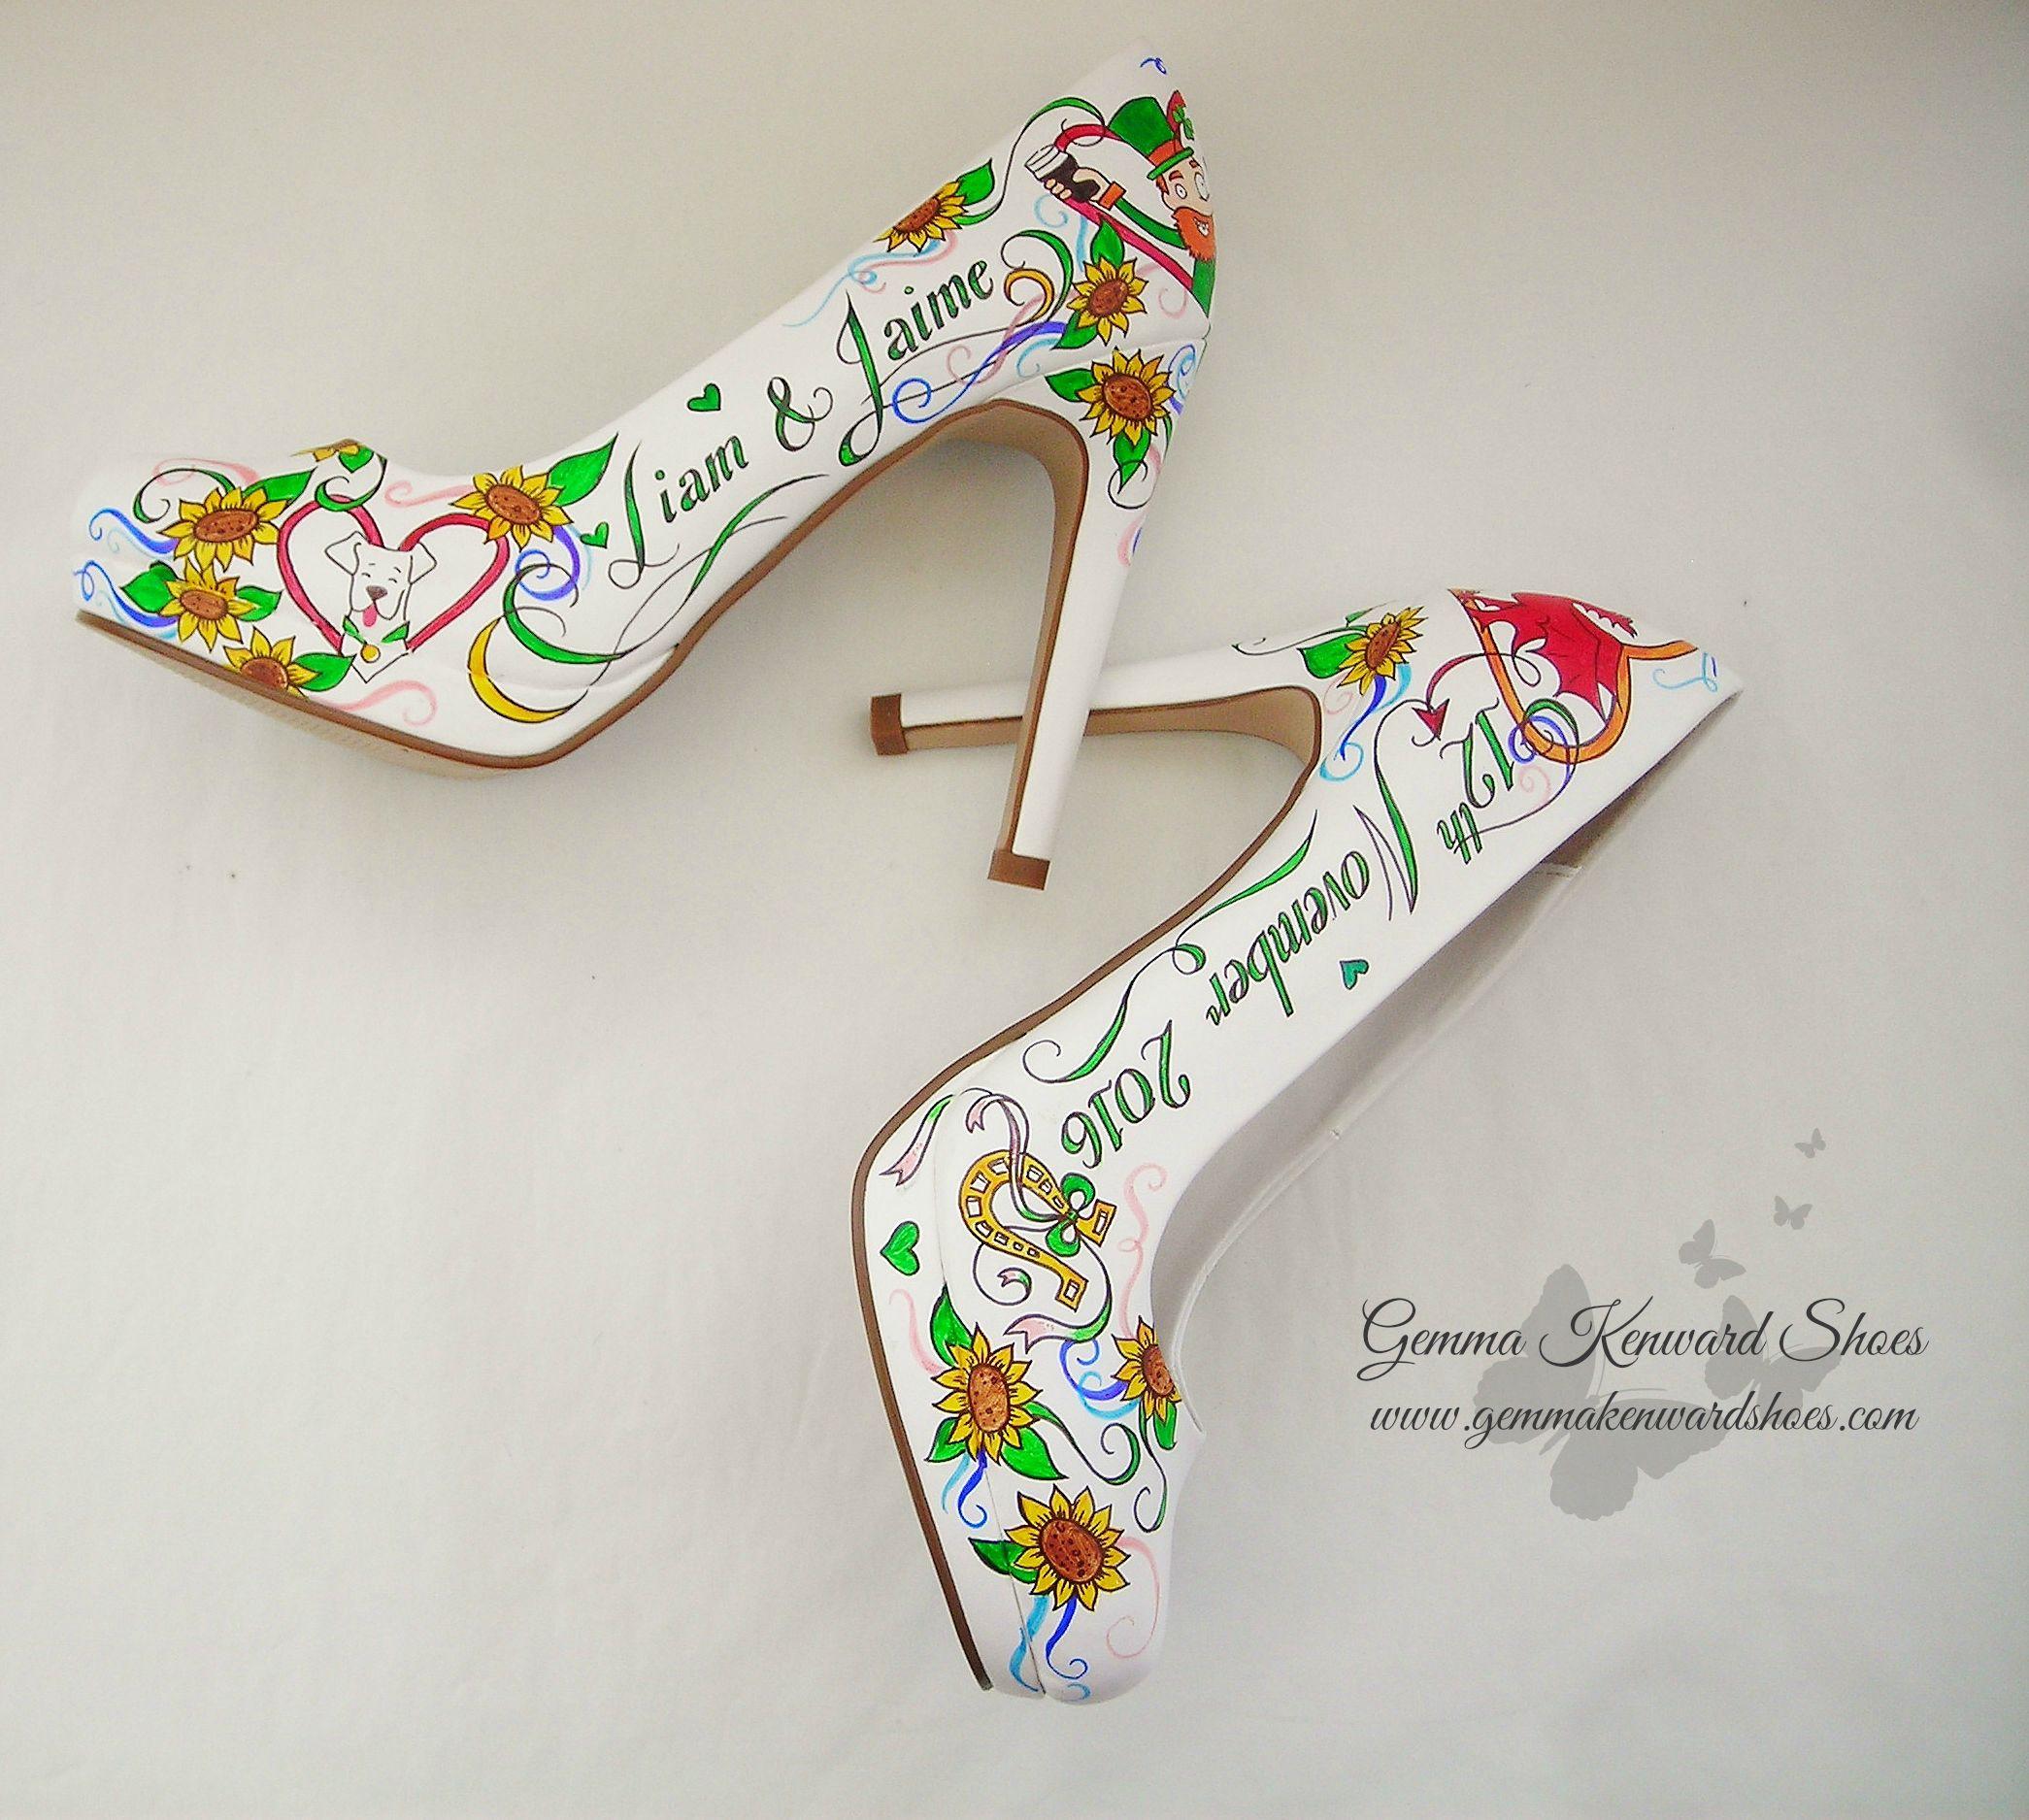 Personalised white leather wedding shoes hand painted with shamrocks, horseshoes and sunflowers